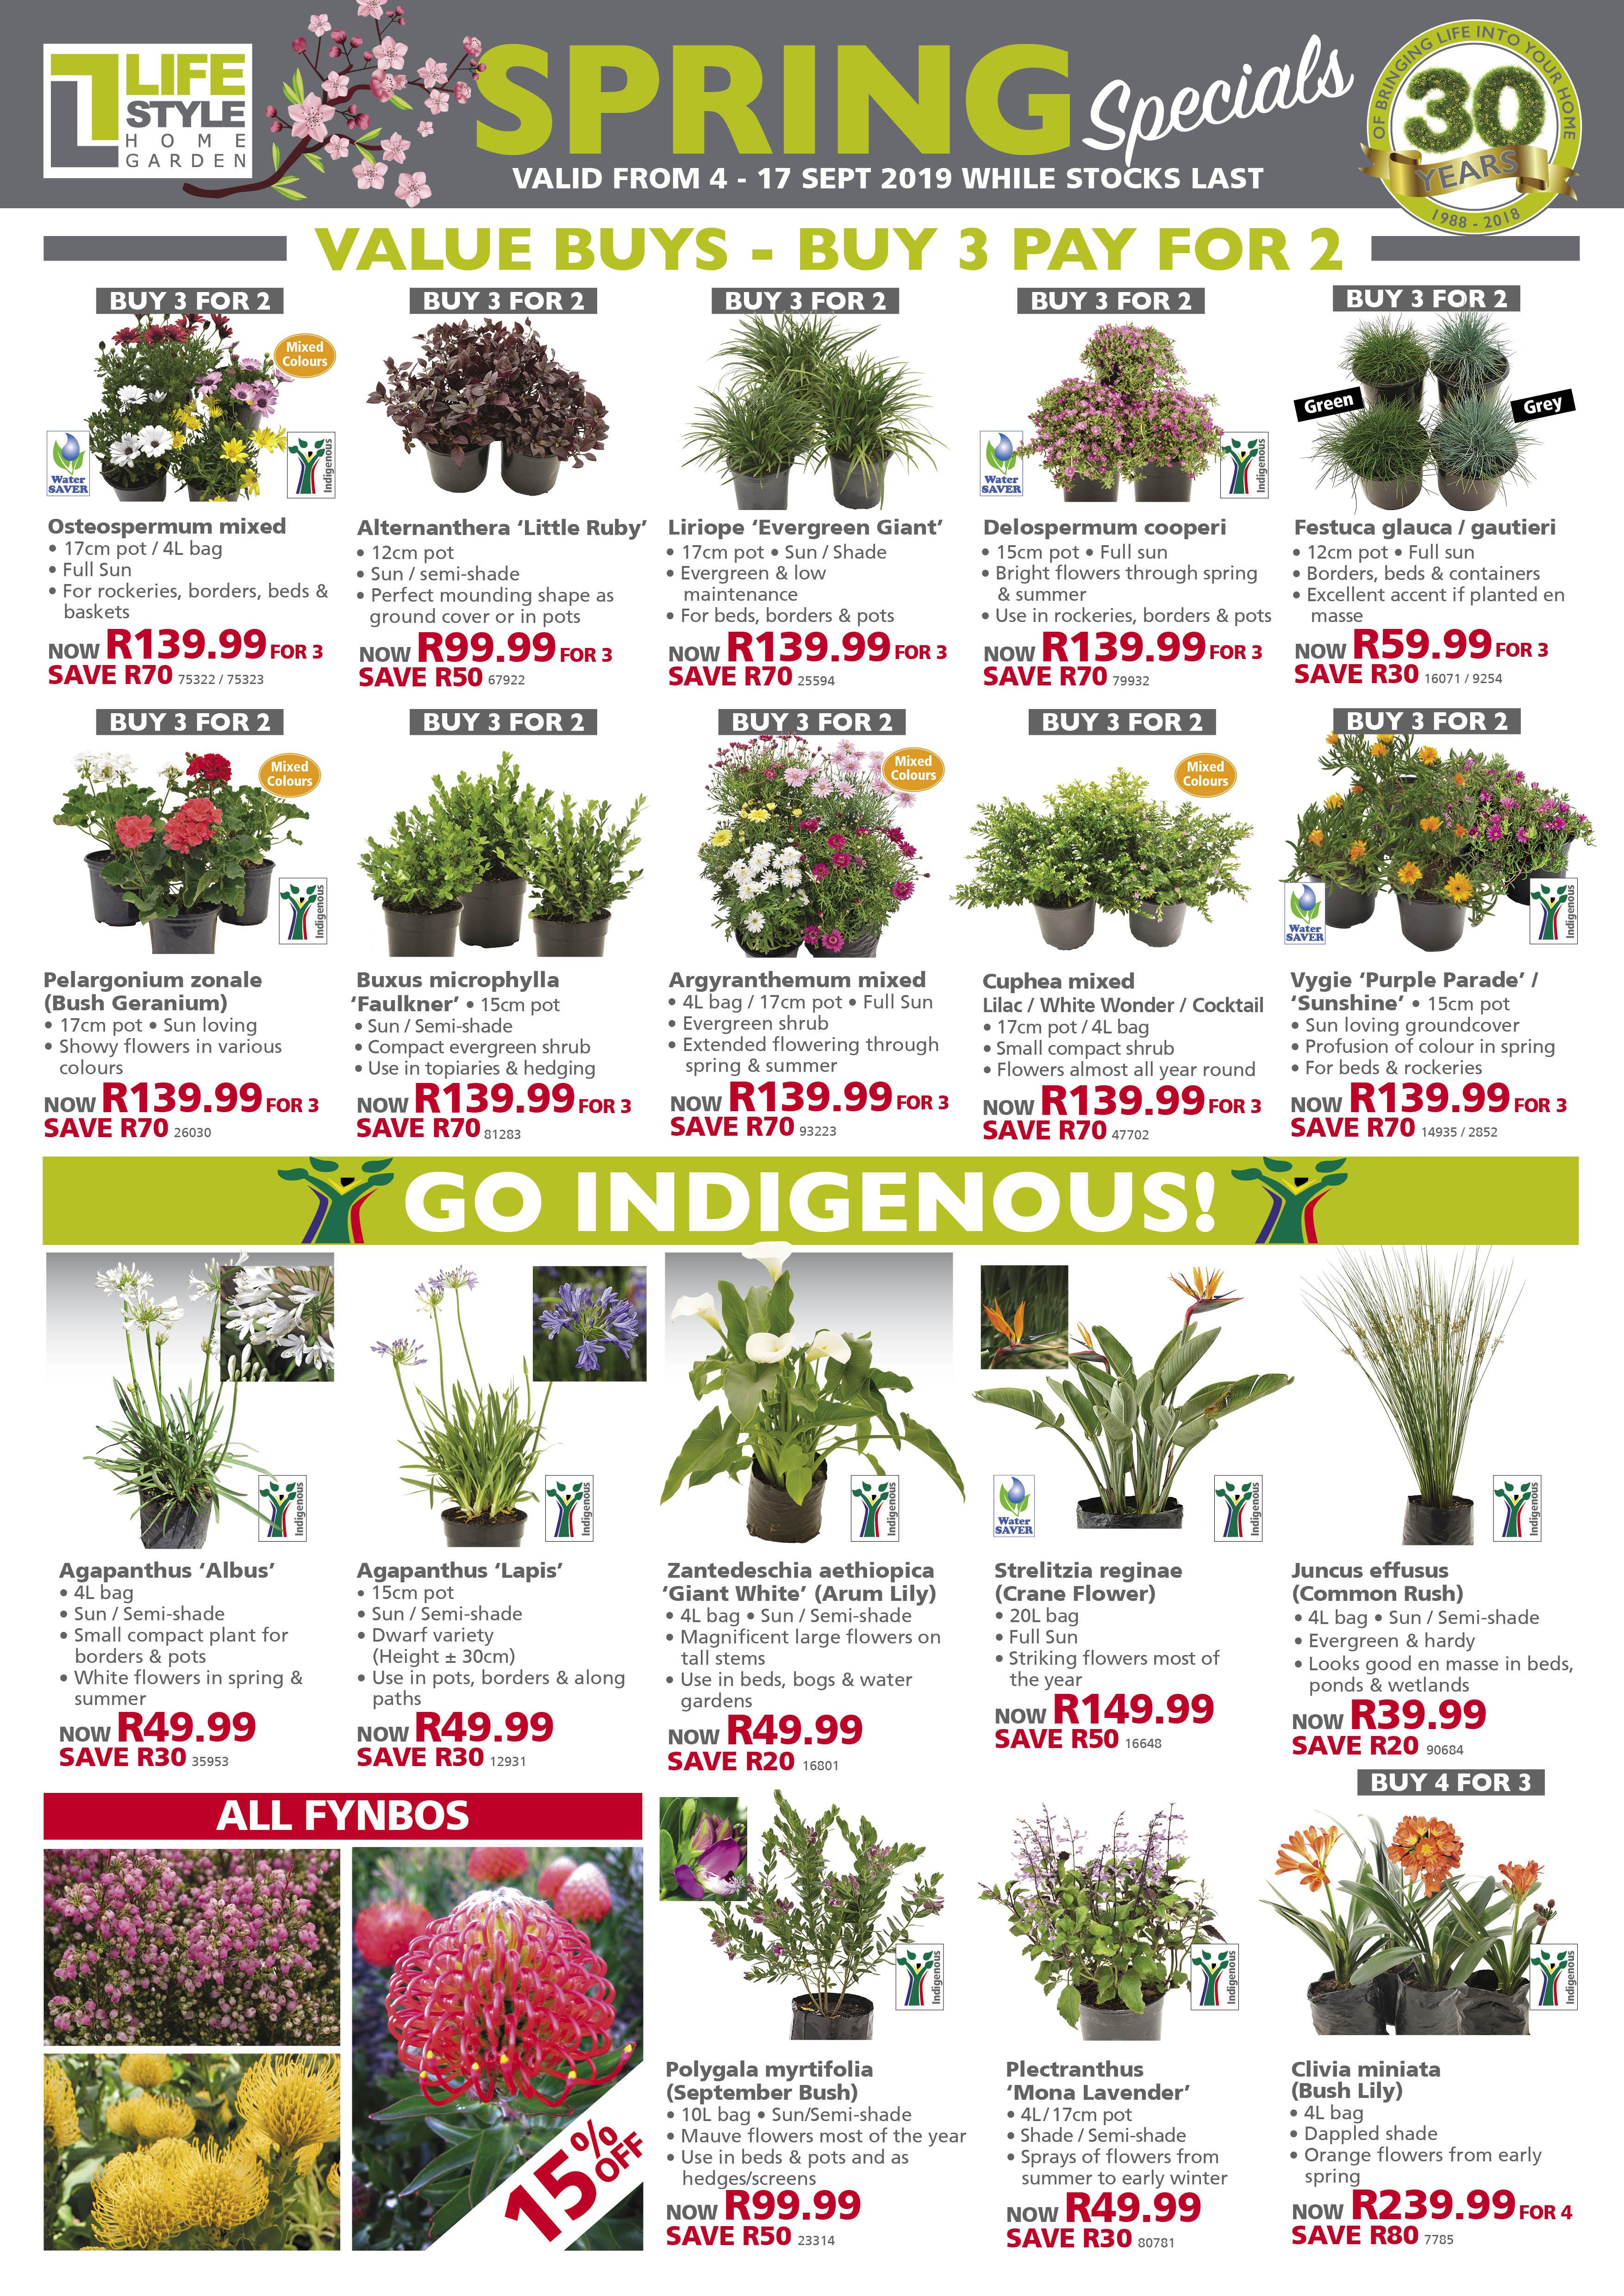 lifestyle home garden leaflet specials indigenous nursery plant shop johannesburg gauteng